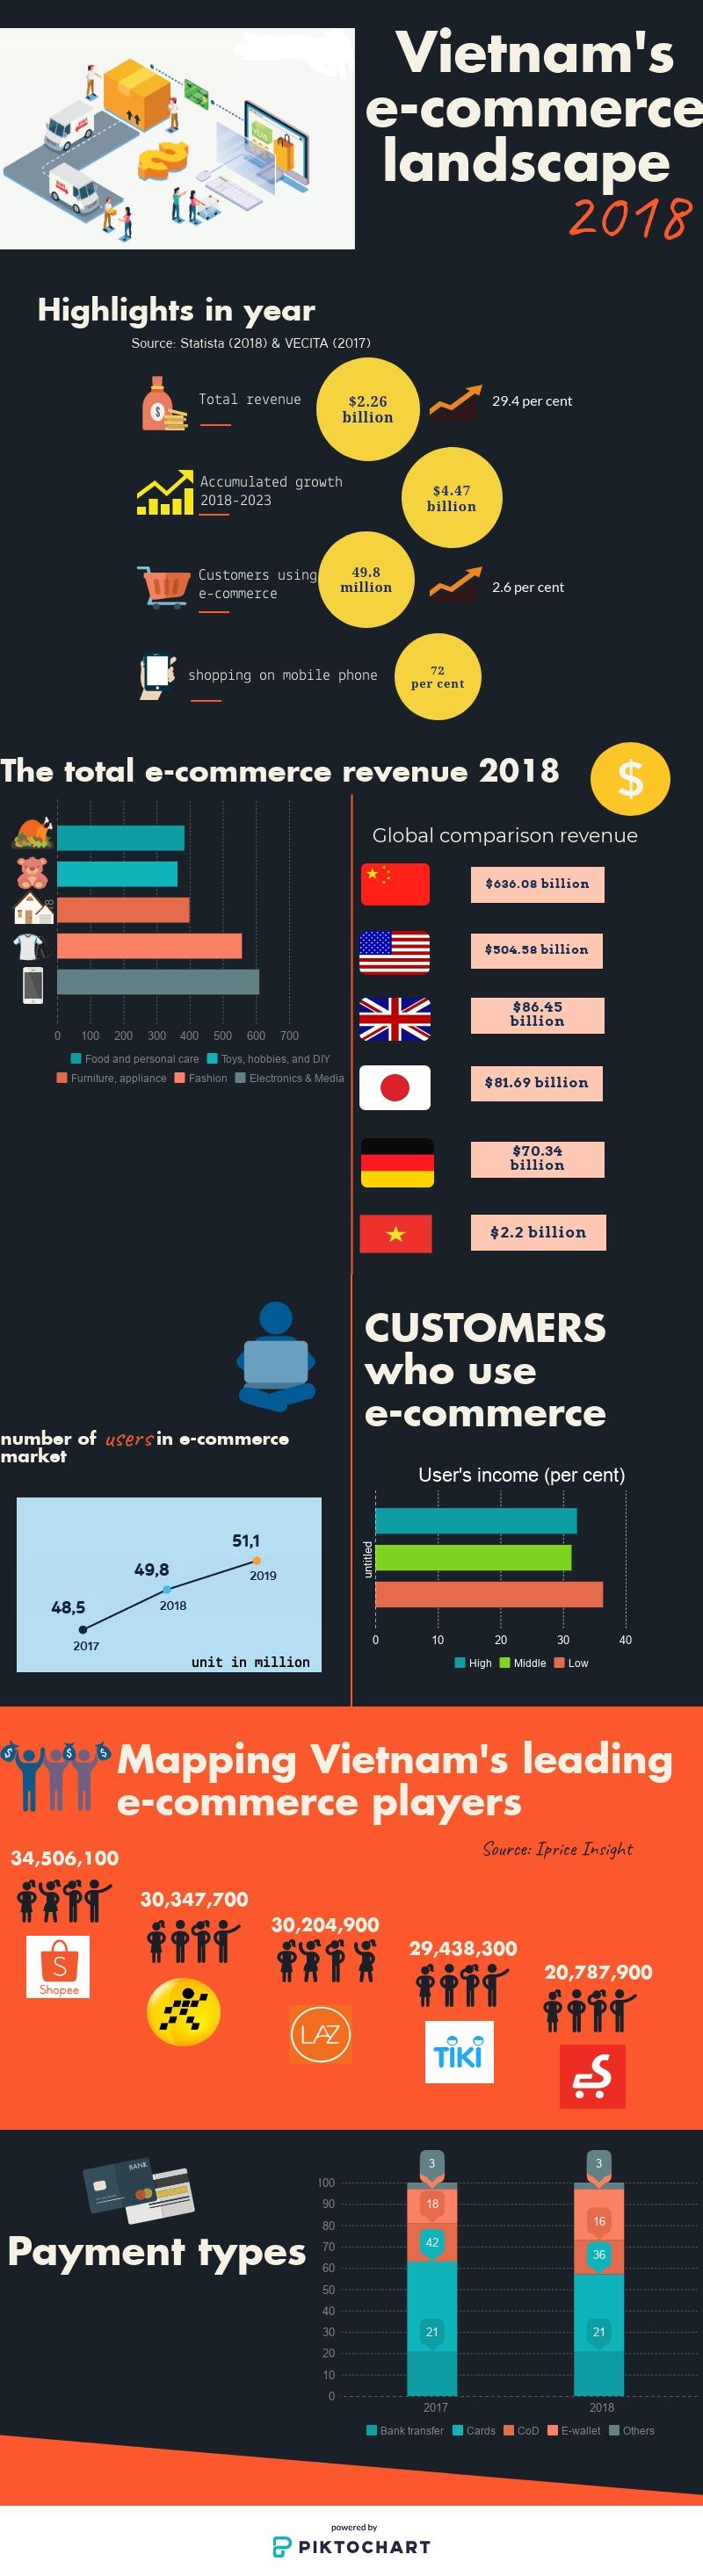 vietnams e commerce landscape in 2018